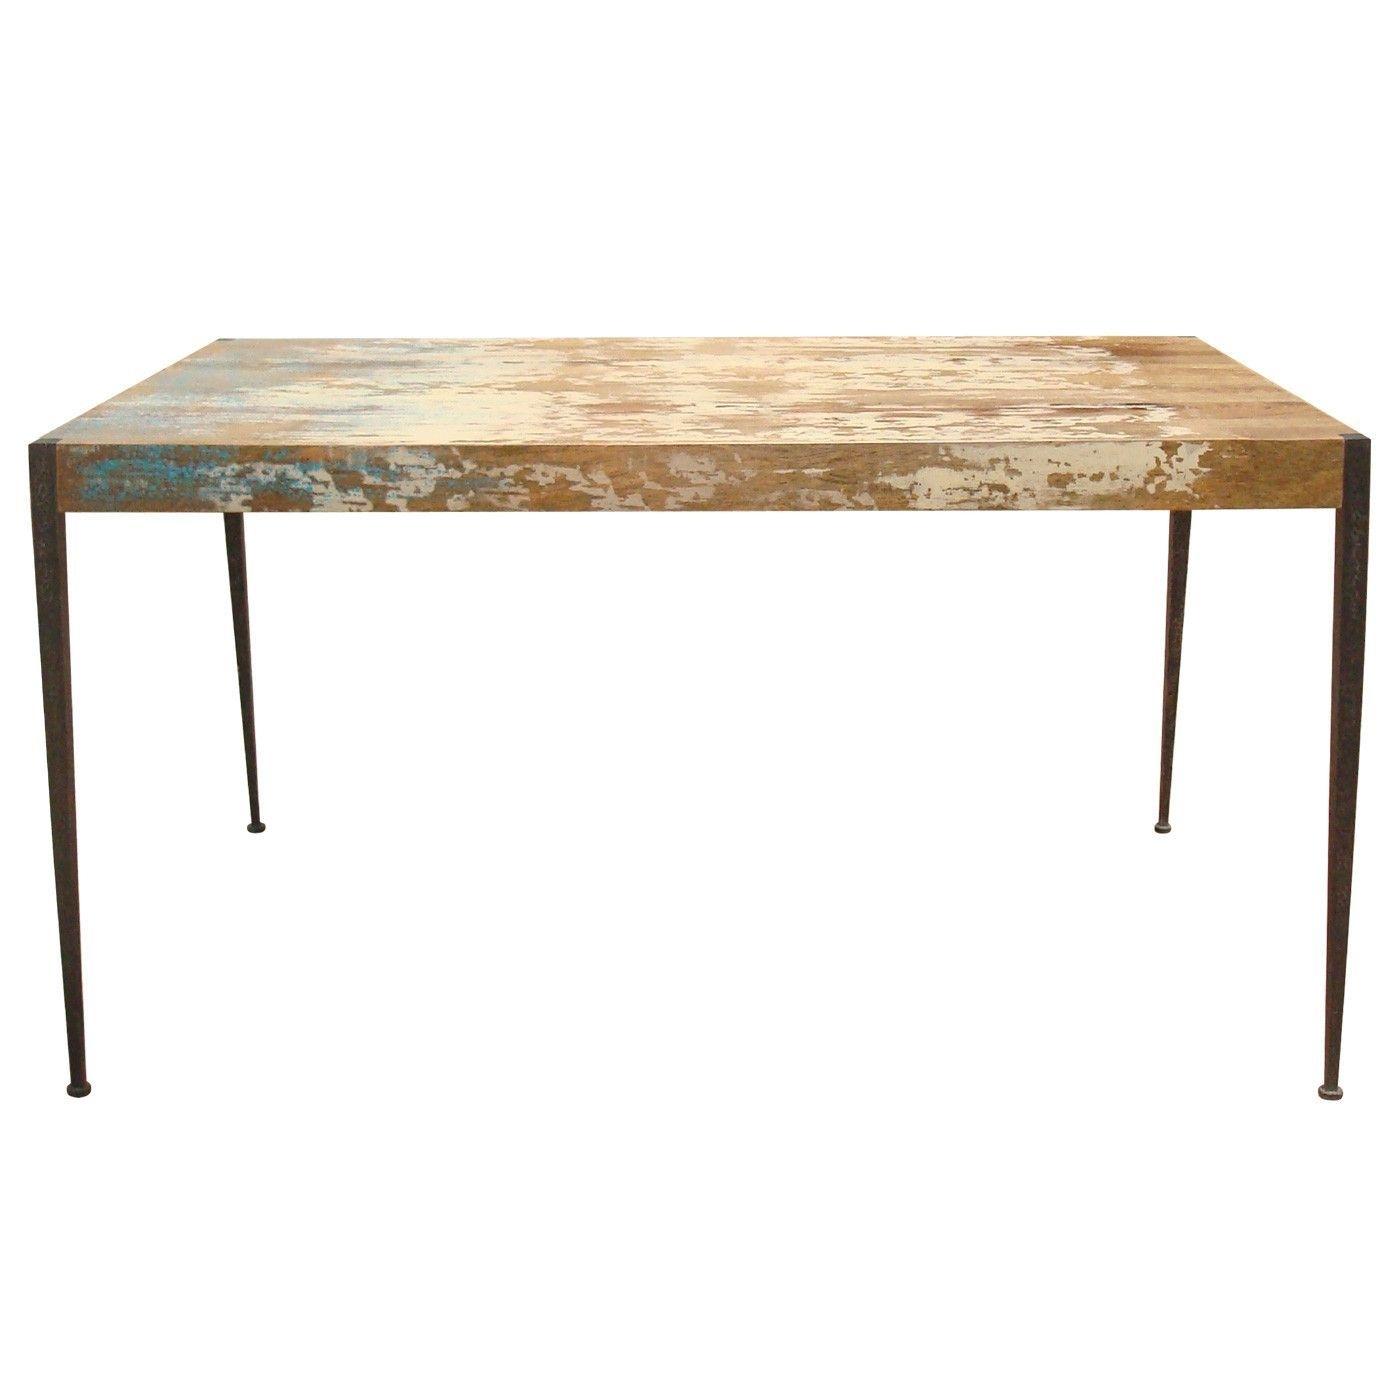 Astoria Dining Table Solid Mango Wood Iron Leg | Products Inside Current Mango Wood/iron Dining Tables (Image 3 of 20)